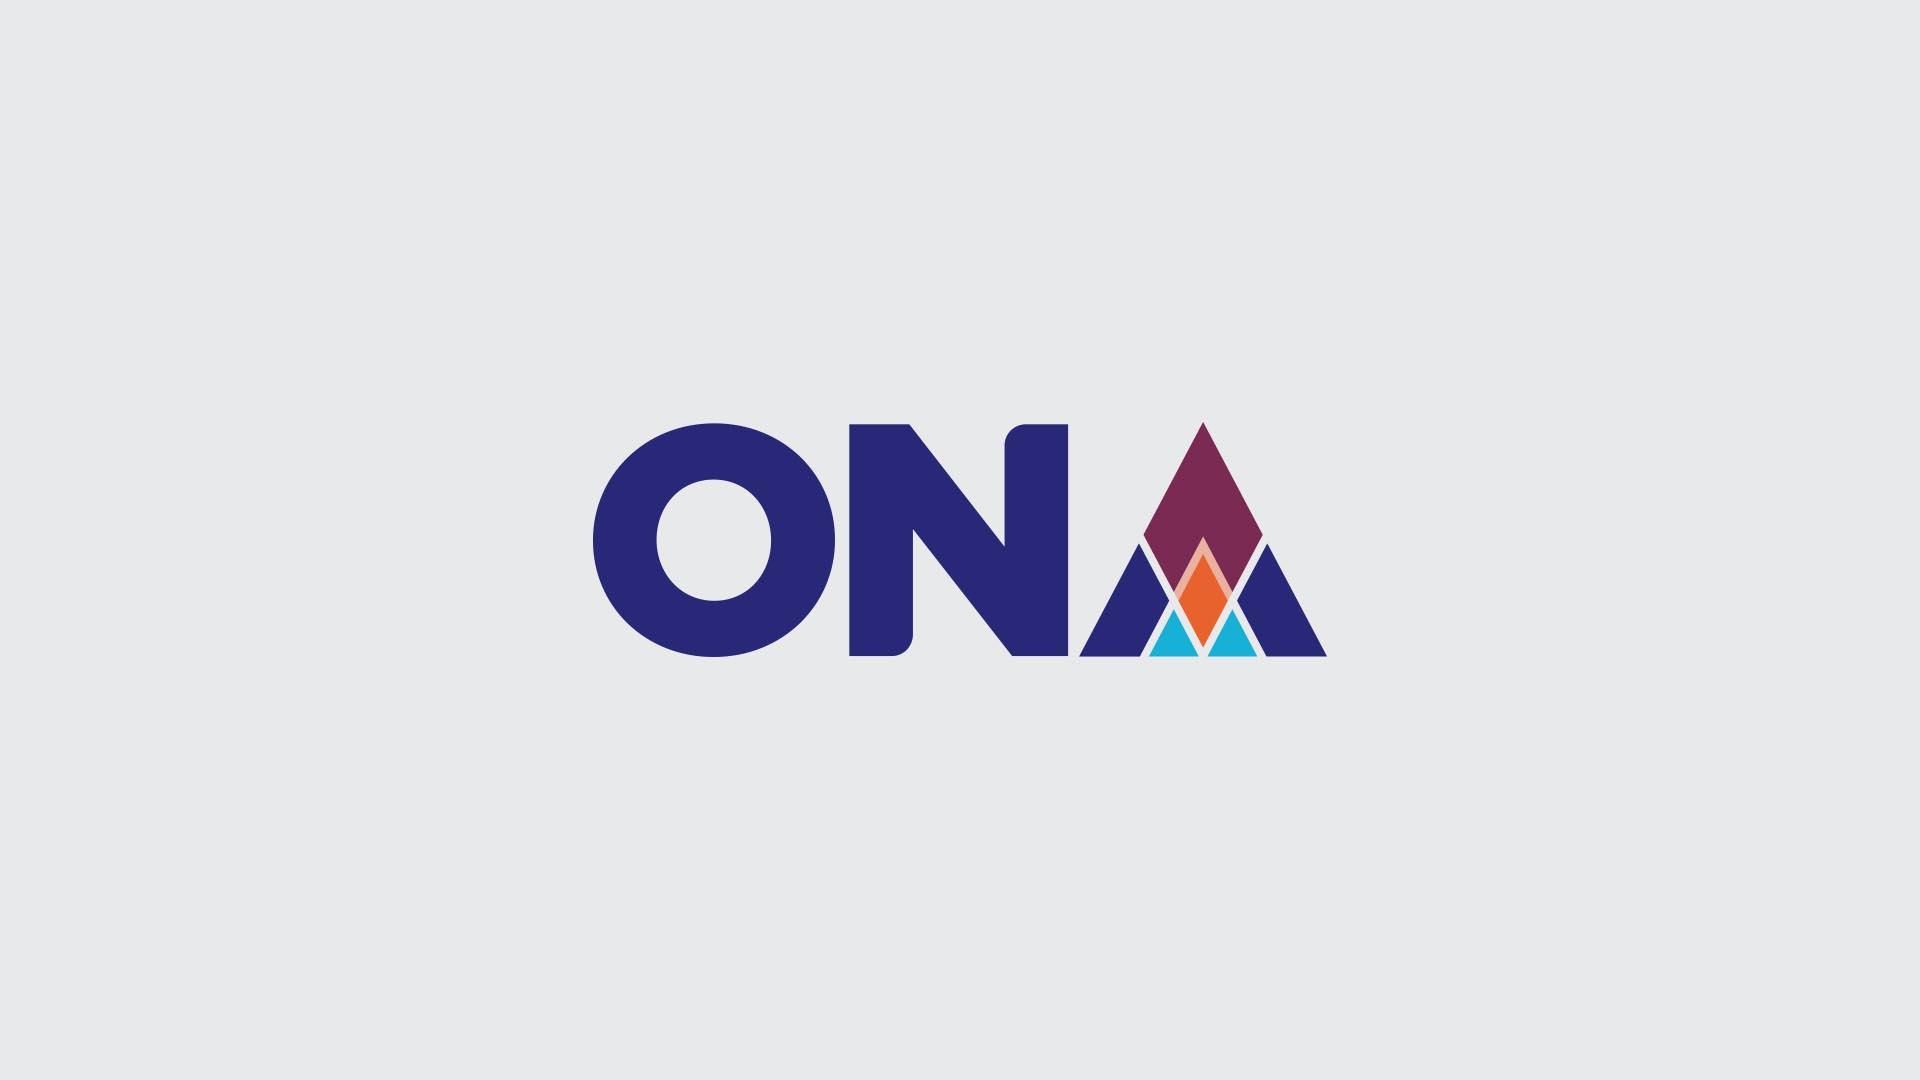 ona_logo_1